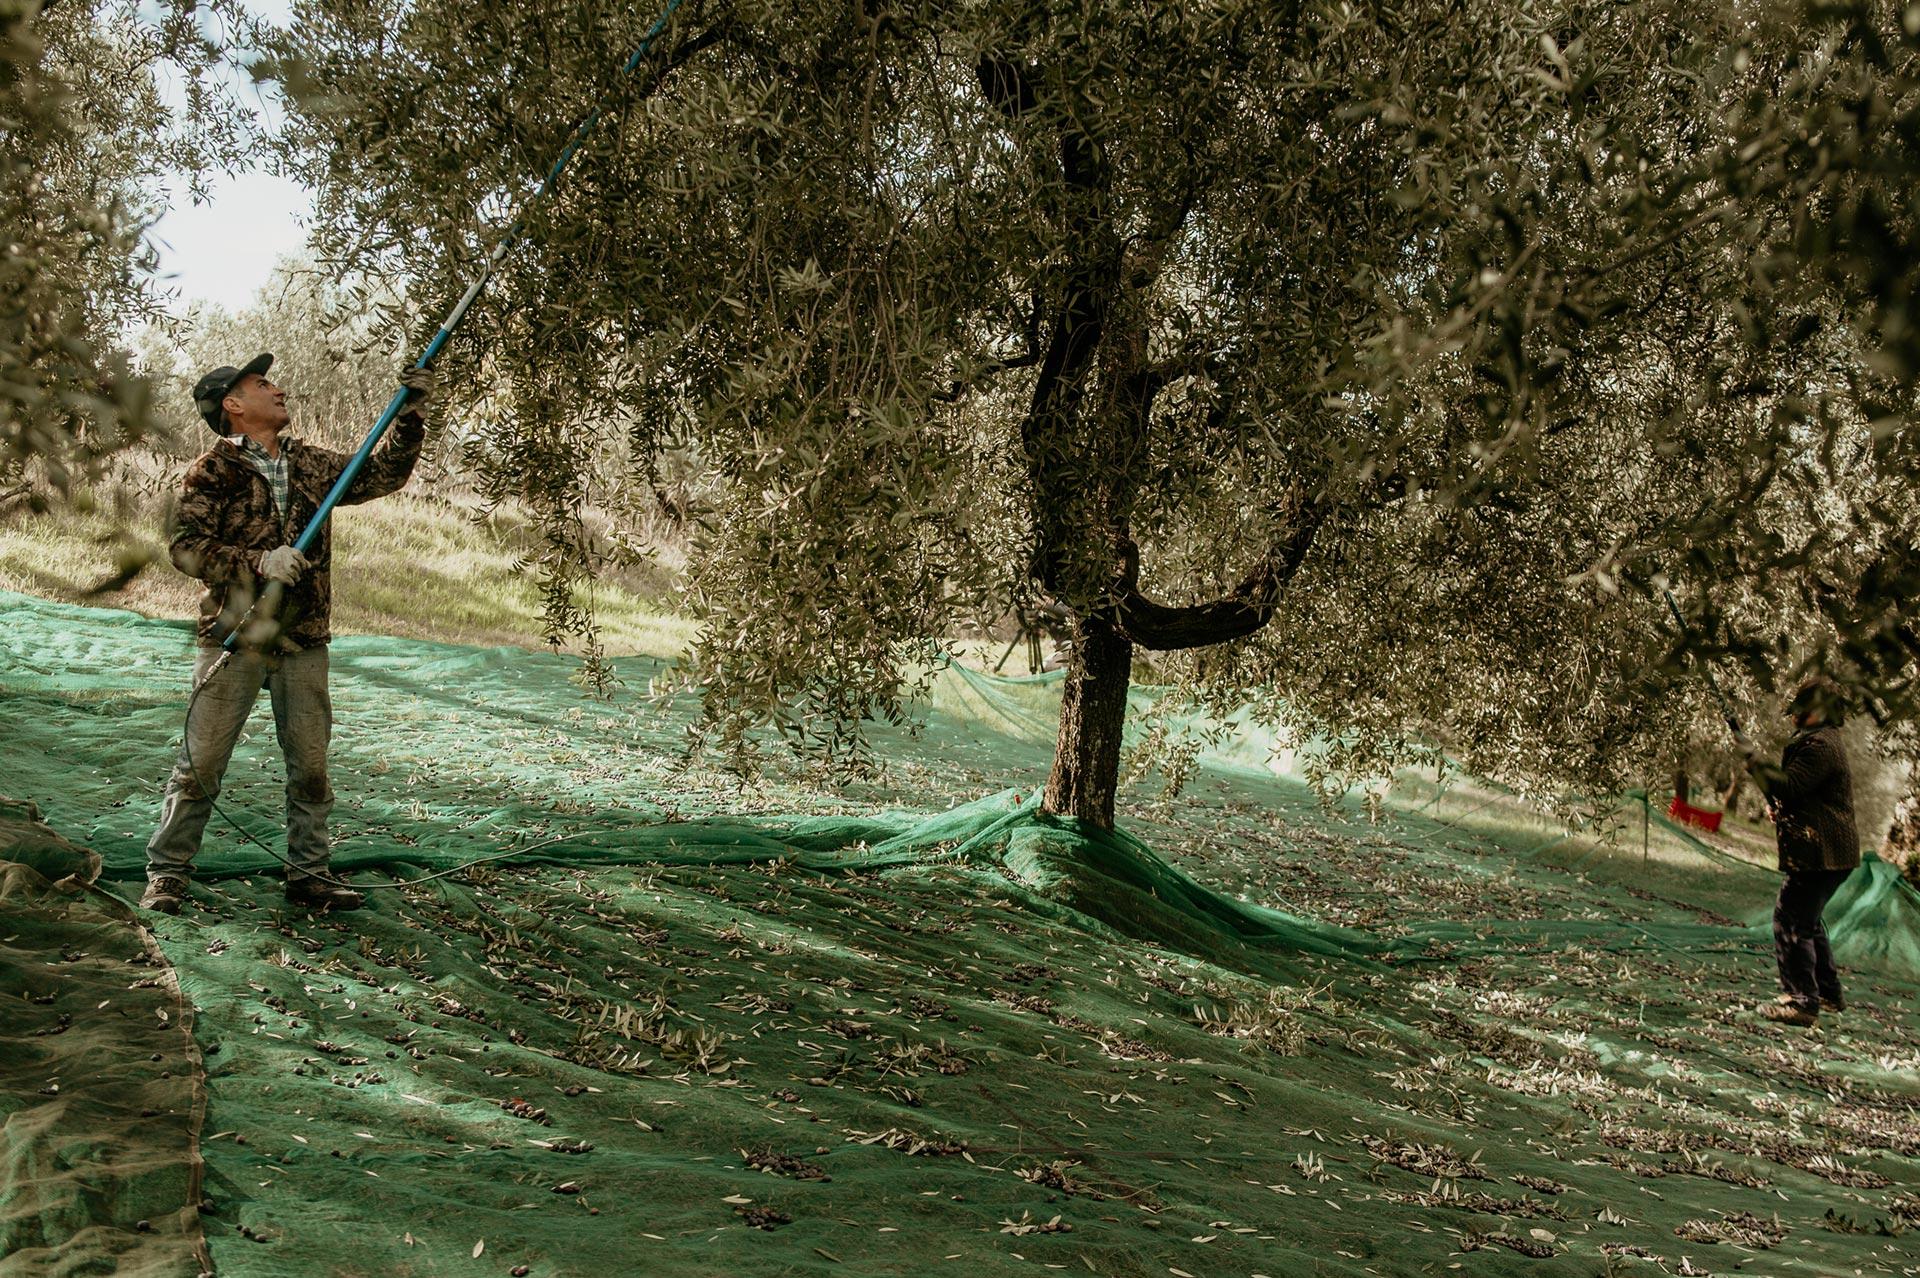 animado-film-produzioni-audiovisive-moricone-olives-02